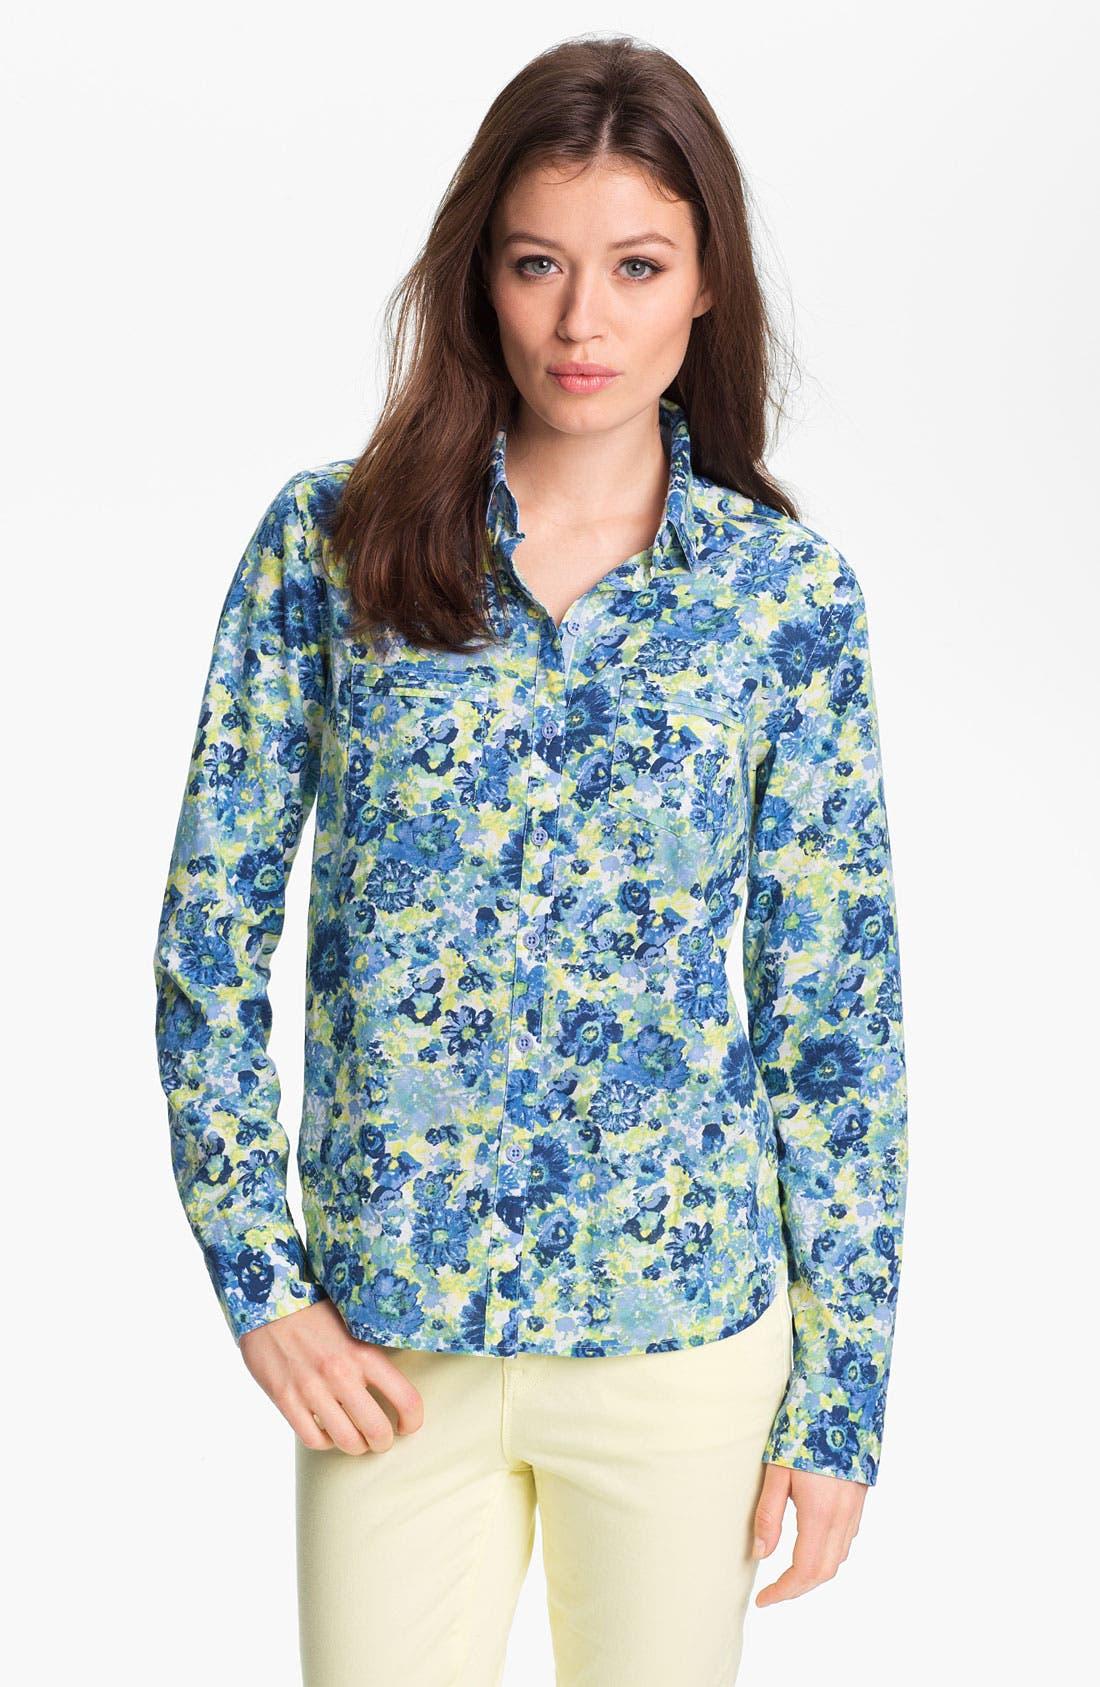 Alternate Image 1 Selected - Isaac Mizrahi Jeans 'Riley' Blouse